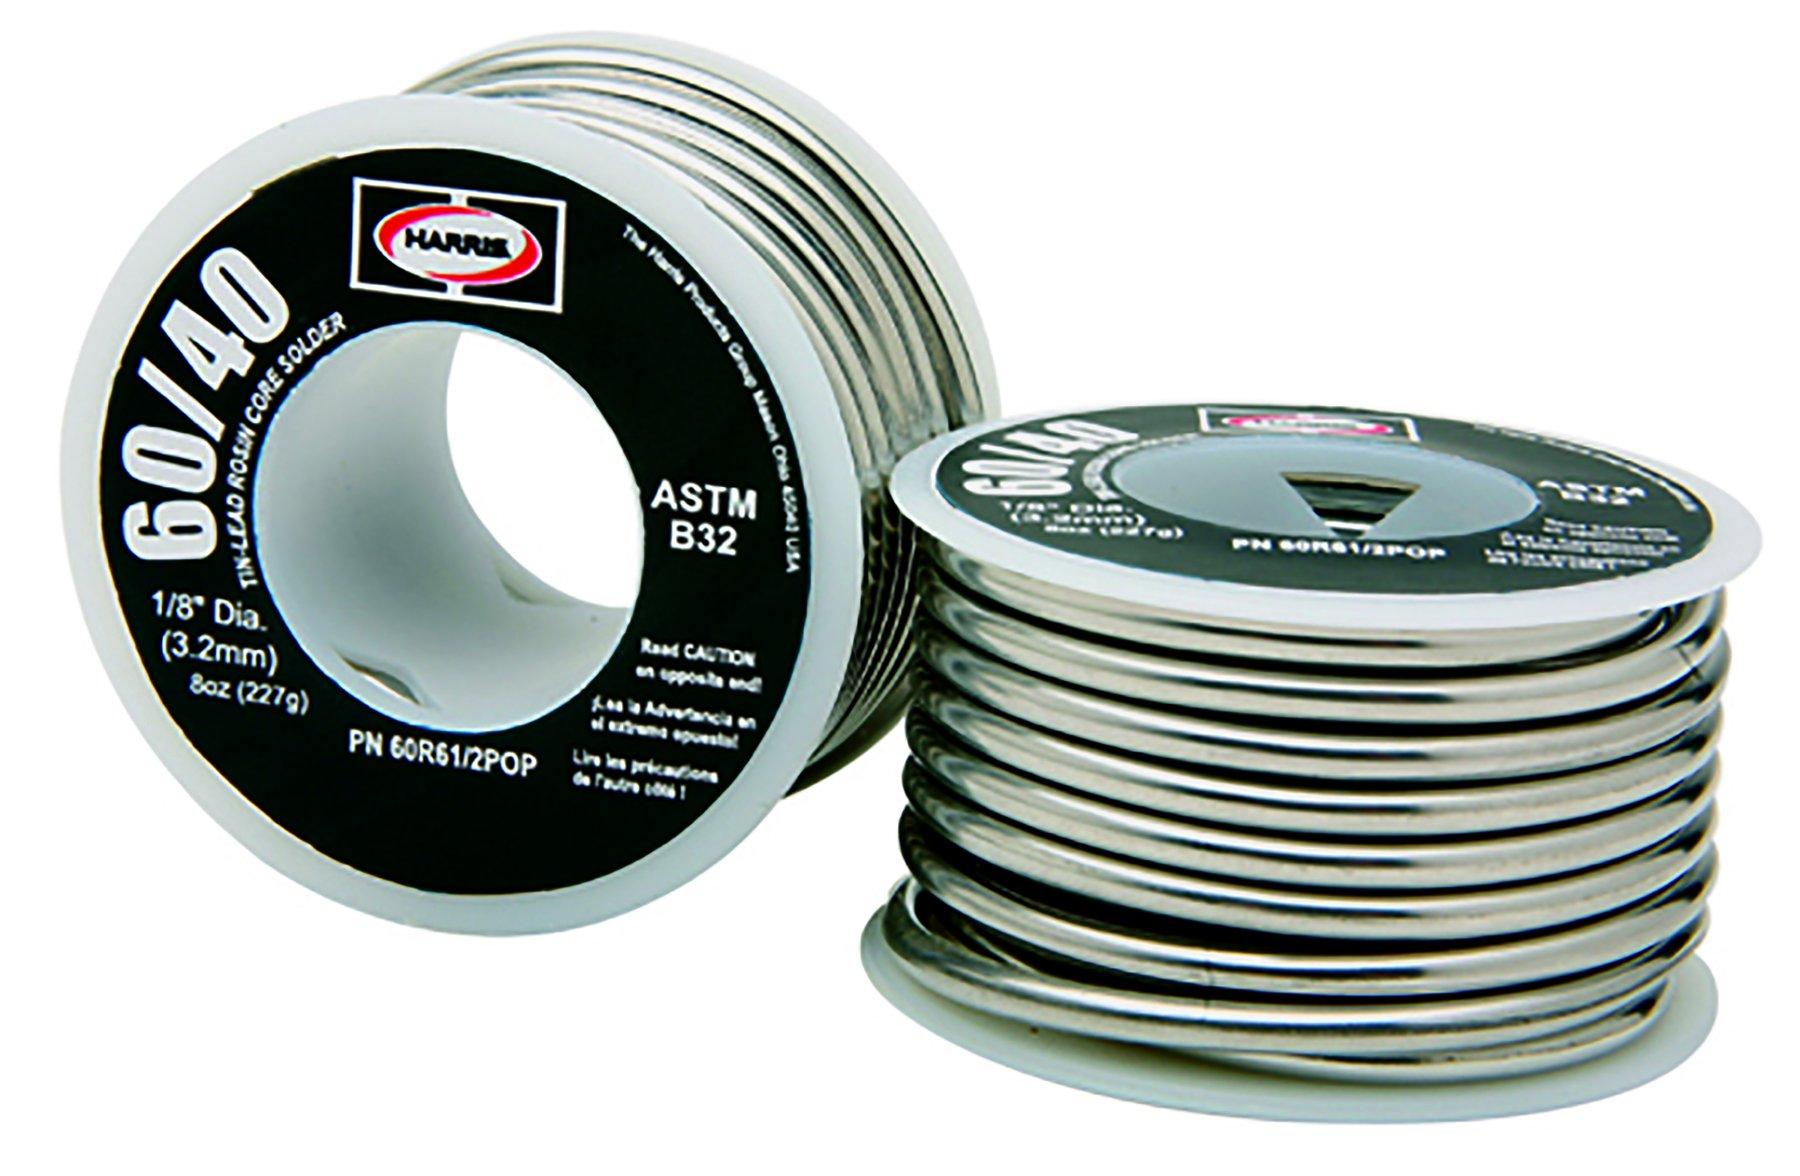 Harris 60R11 60/40 Rosin Core Lead Solder, 1/32'' x 1 lb. Spool